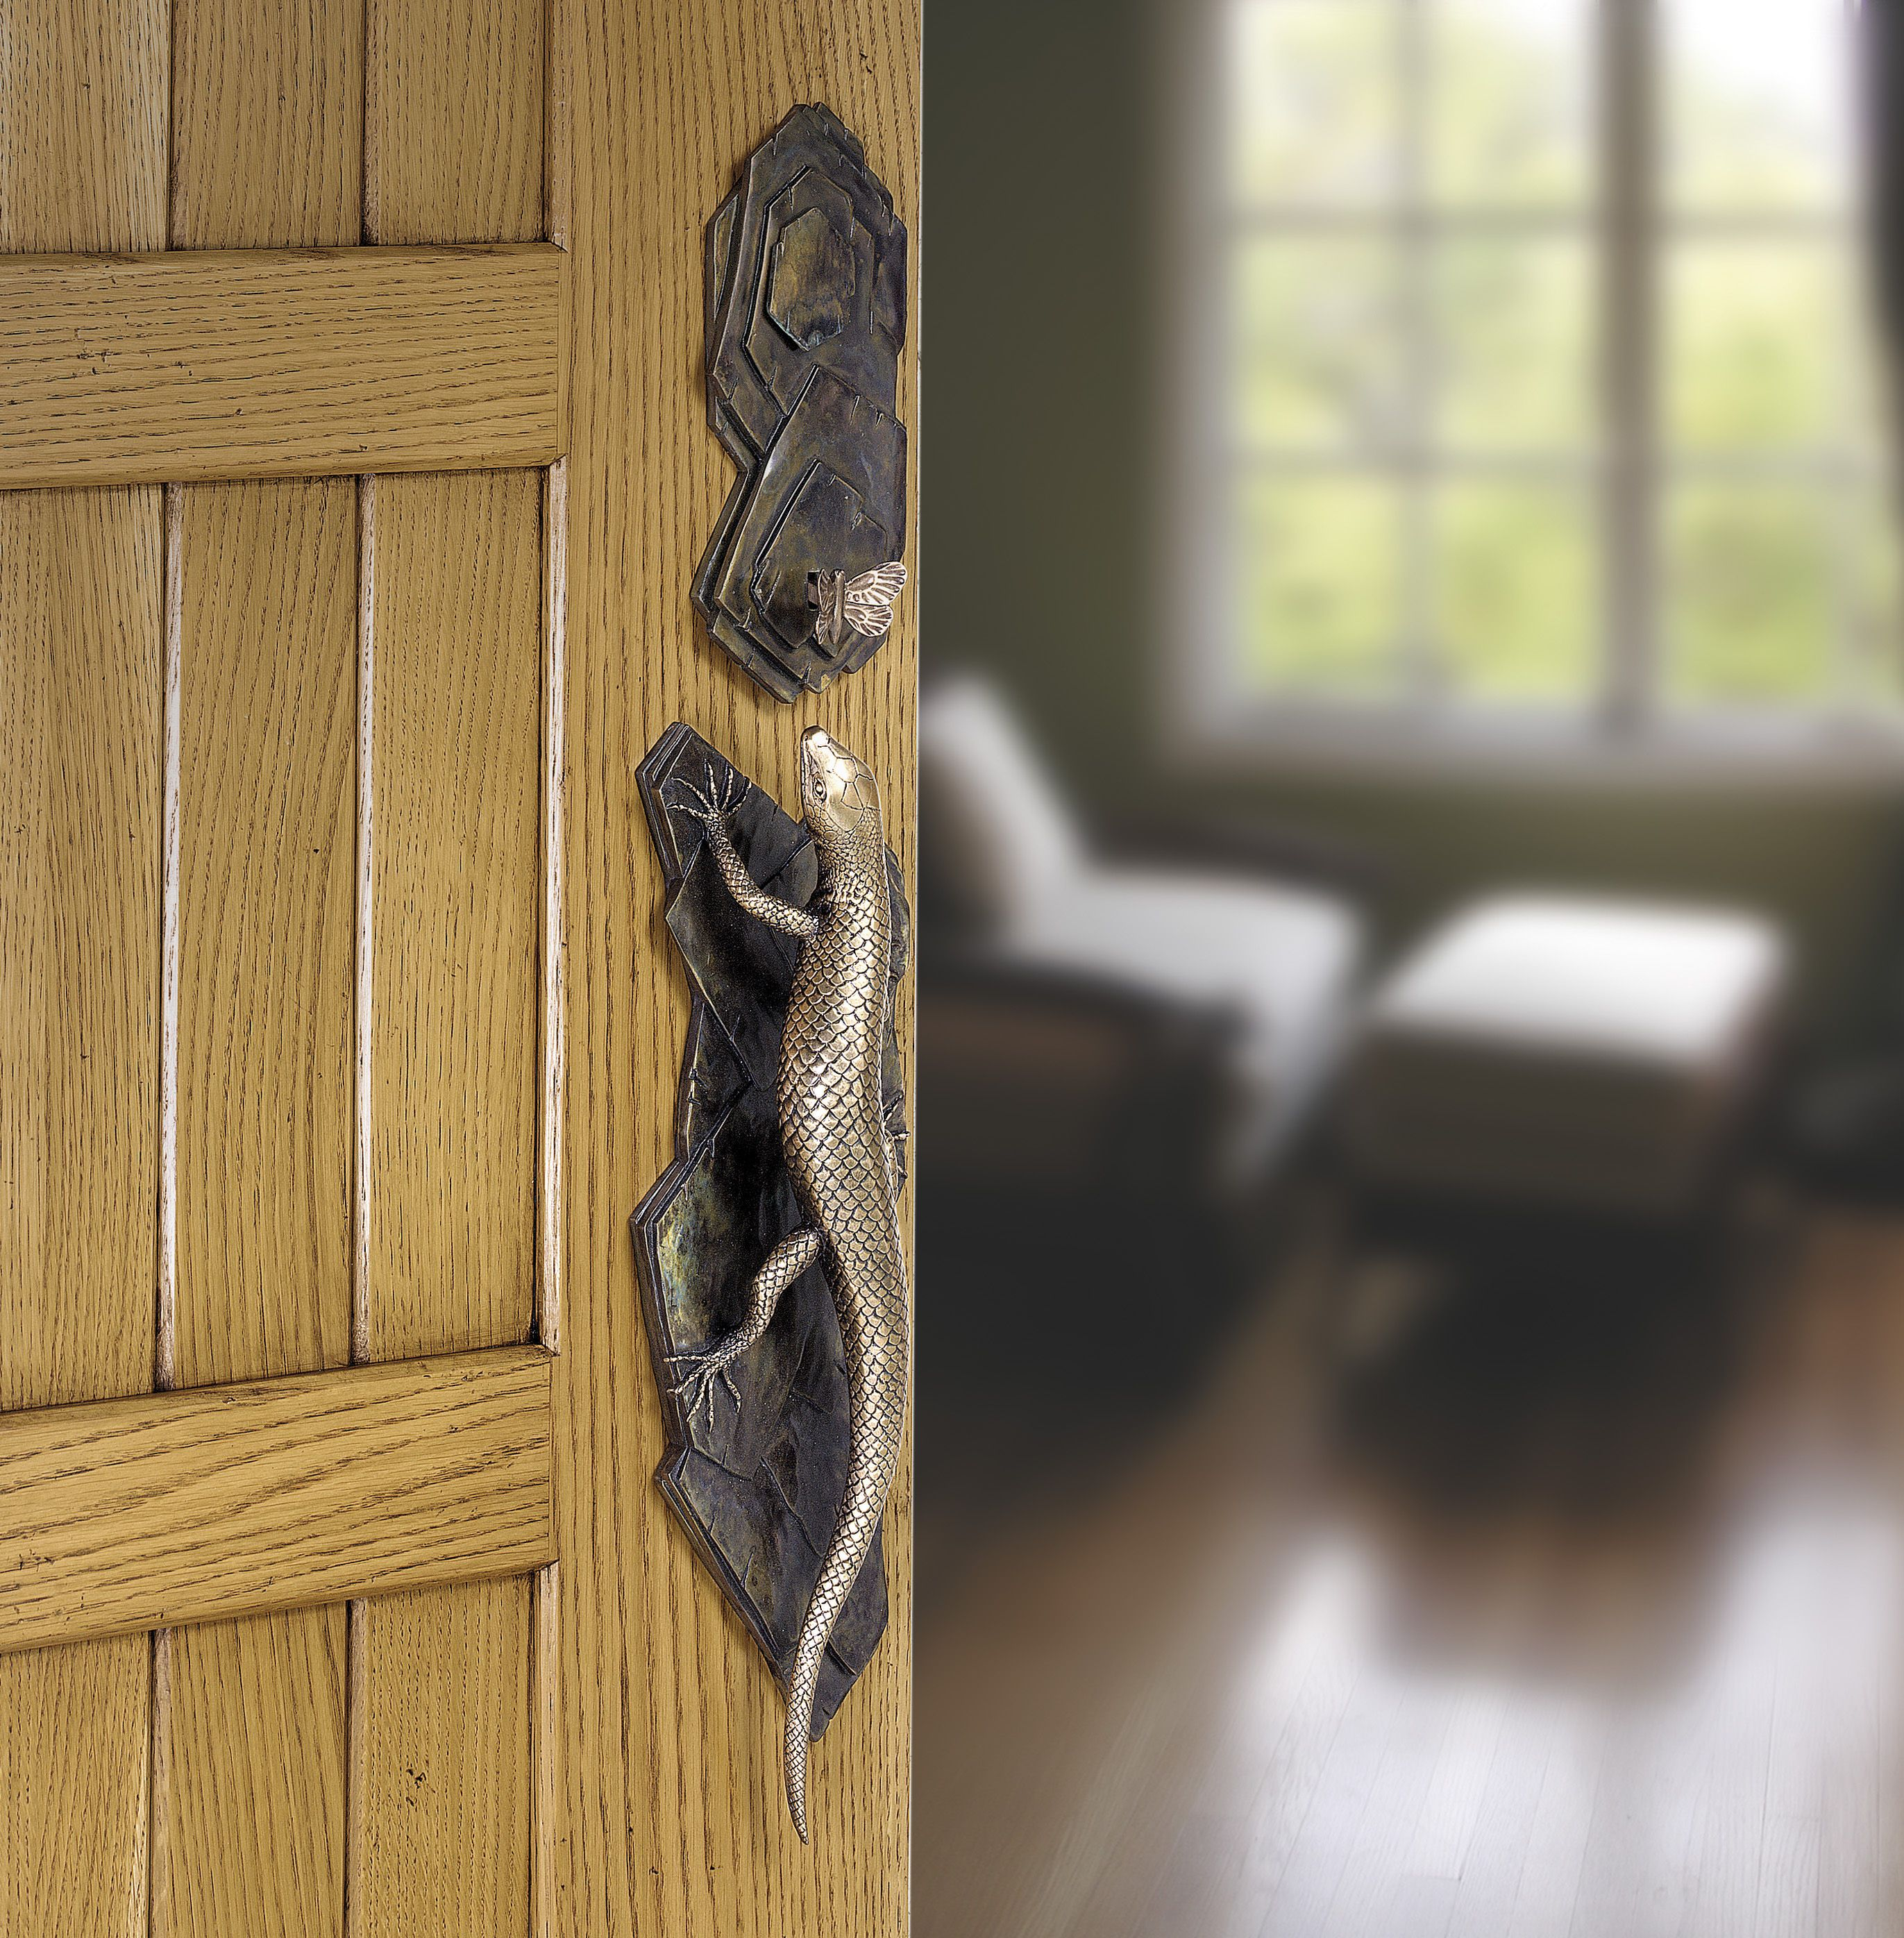 Lizard and Butterfly Door Handle | Locks, Latches, Handles, Knockers ...